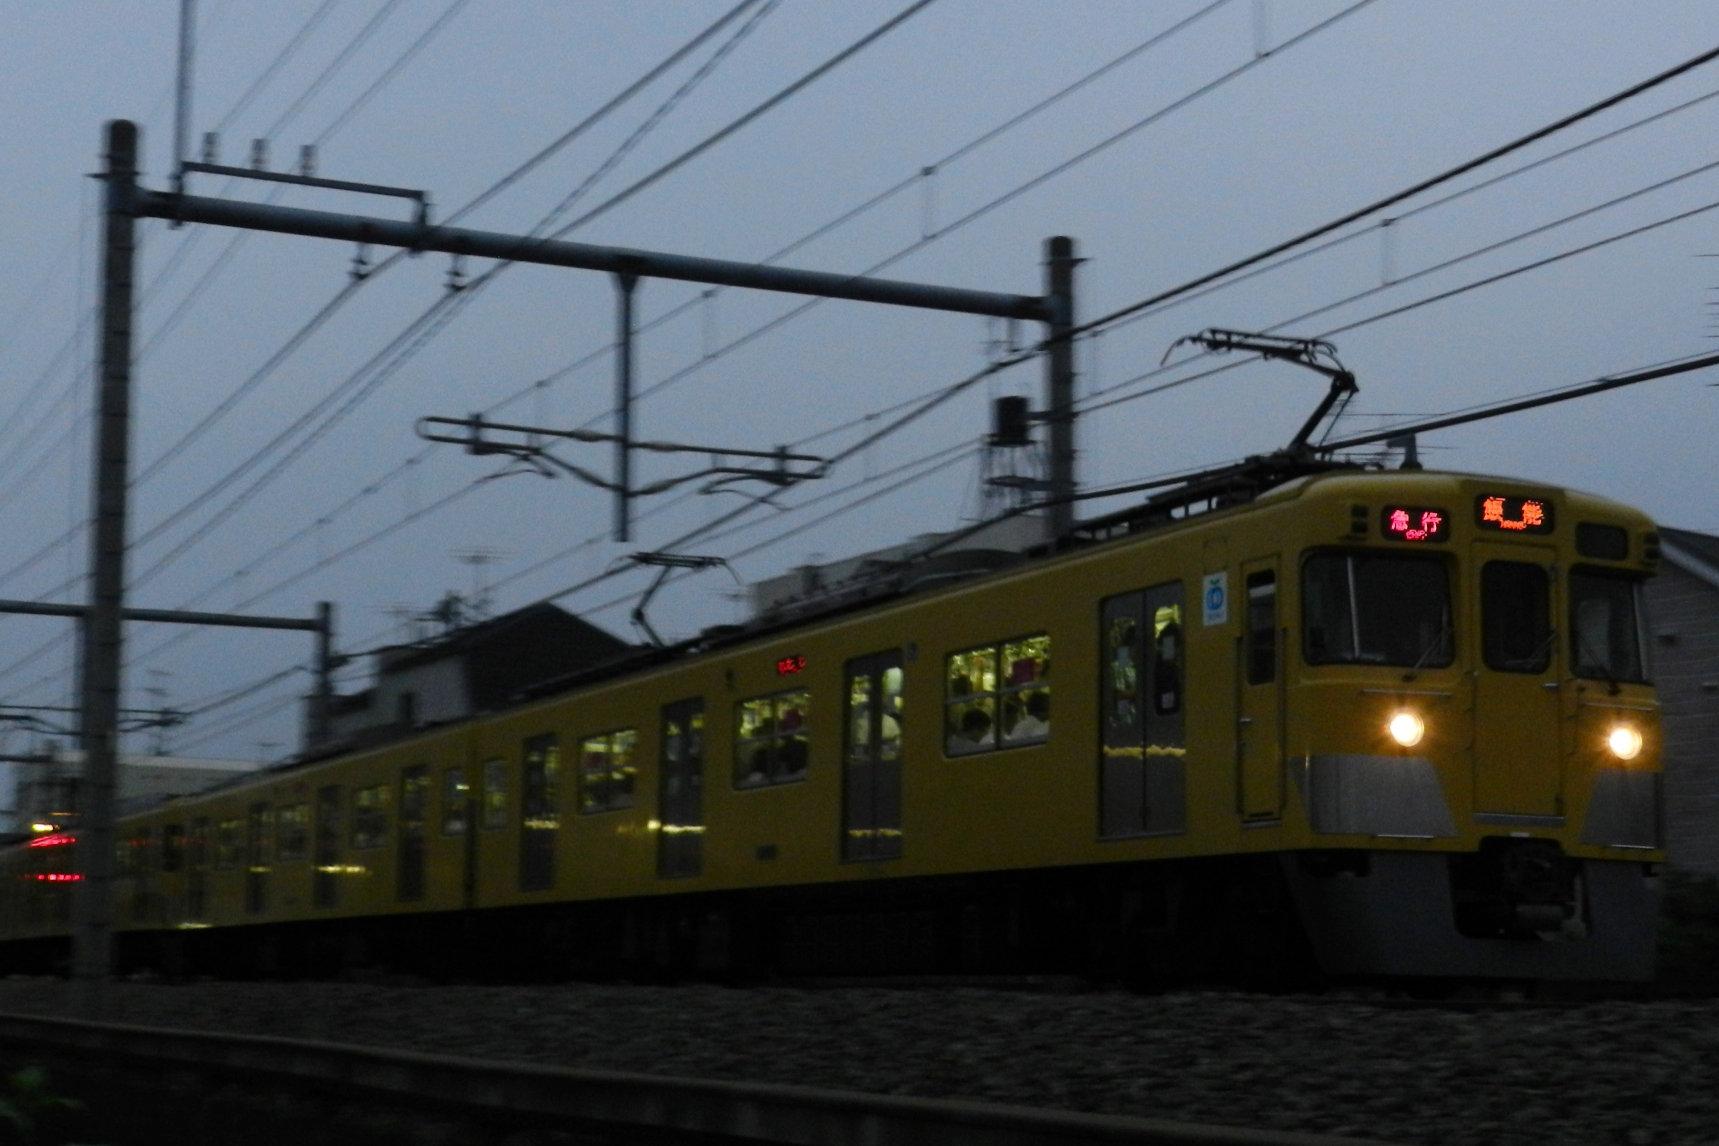 2013-07-30 001 059[2]